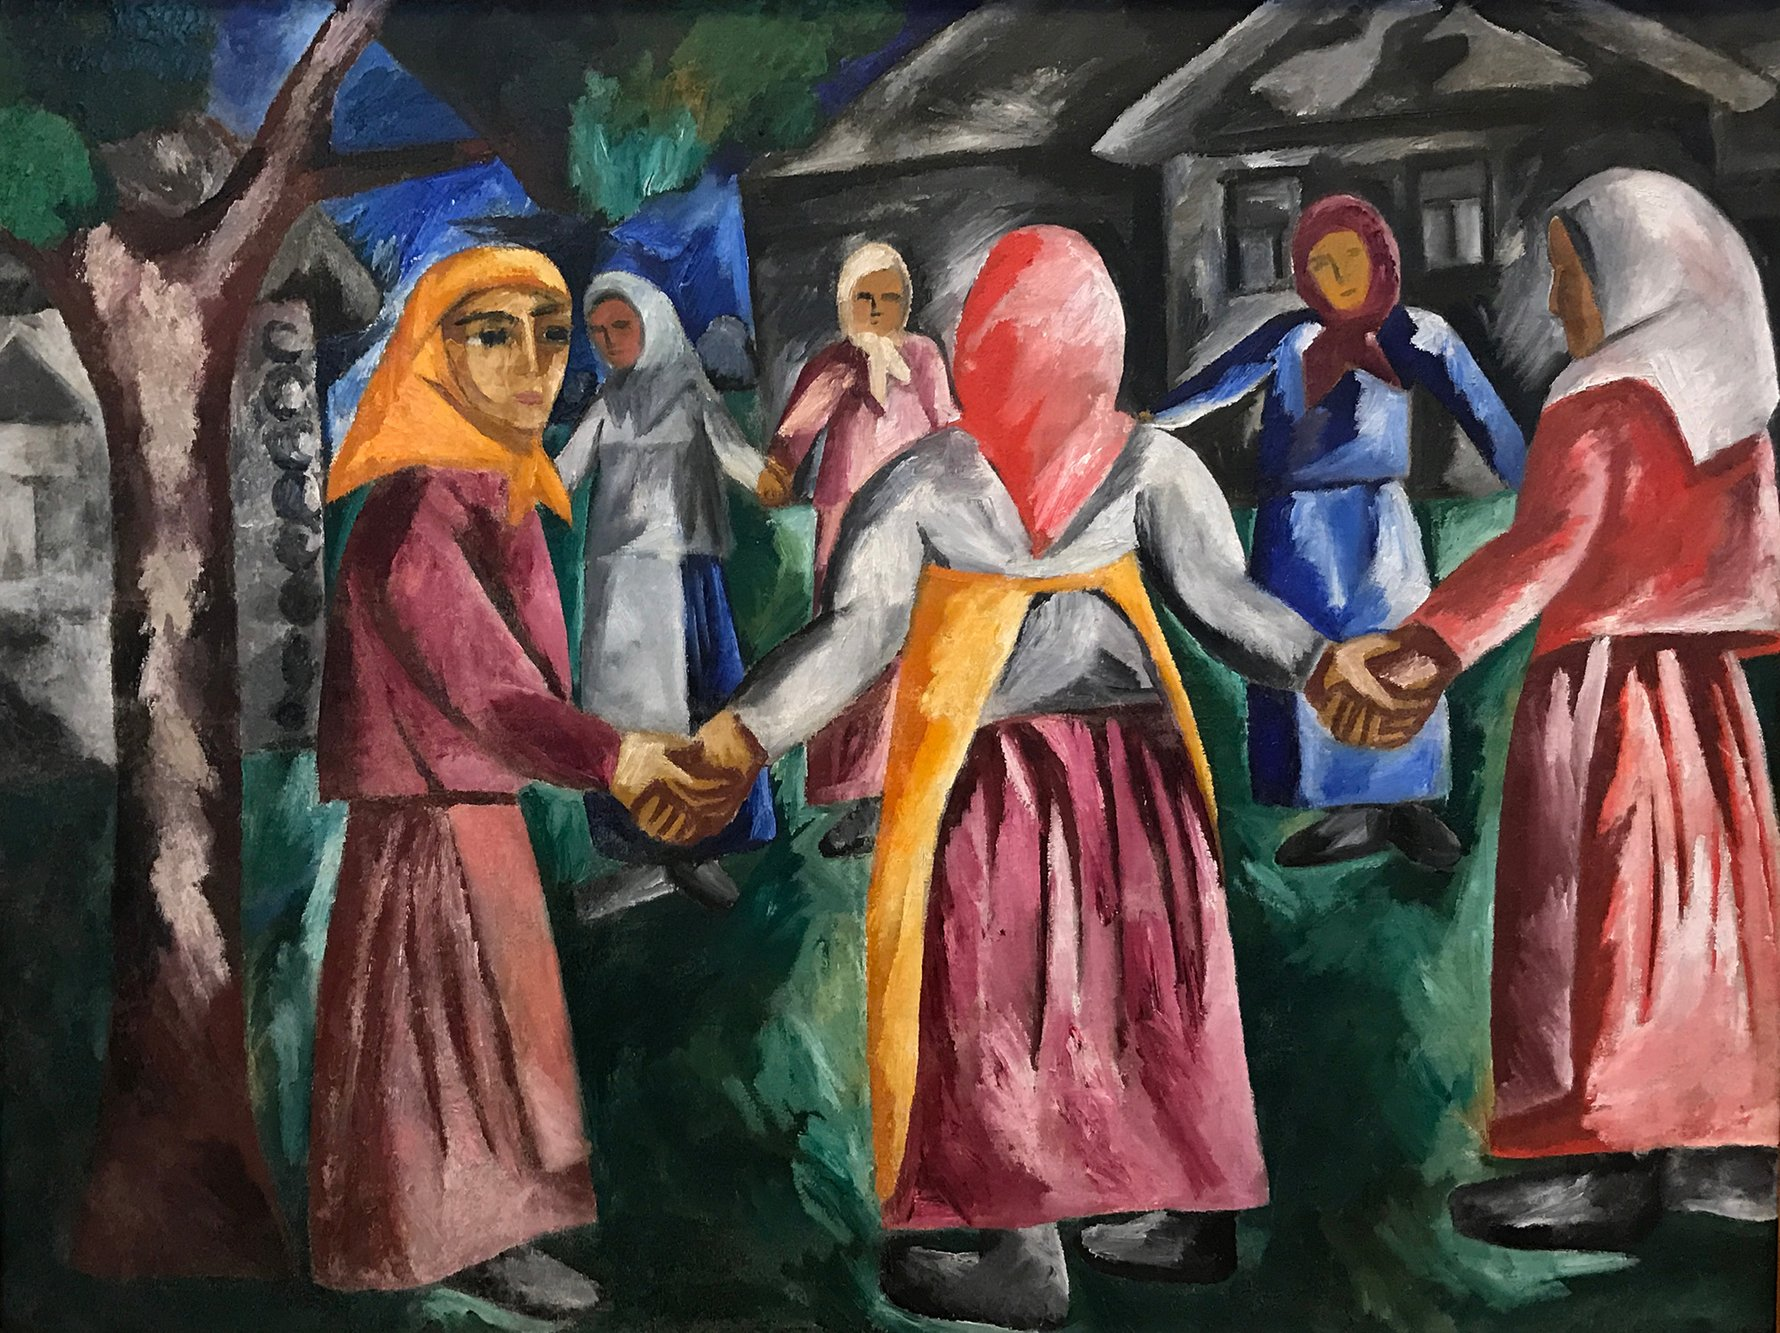 Russian Art - Natalia Goncharova, Untitled 1910